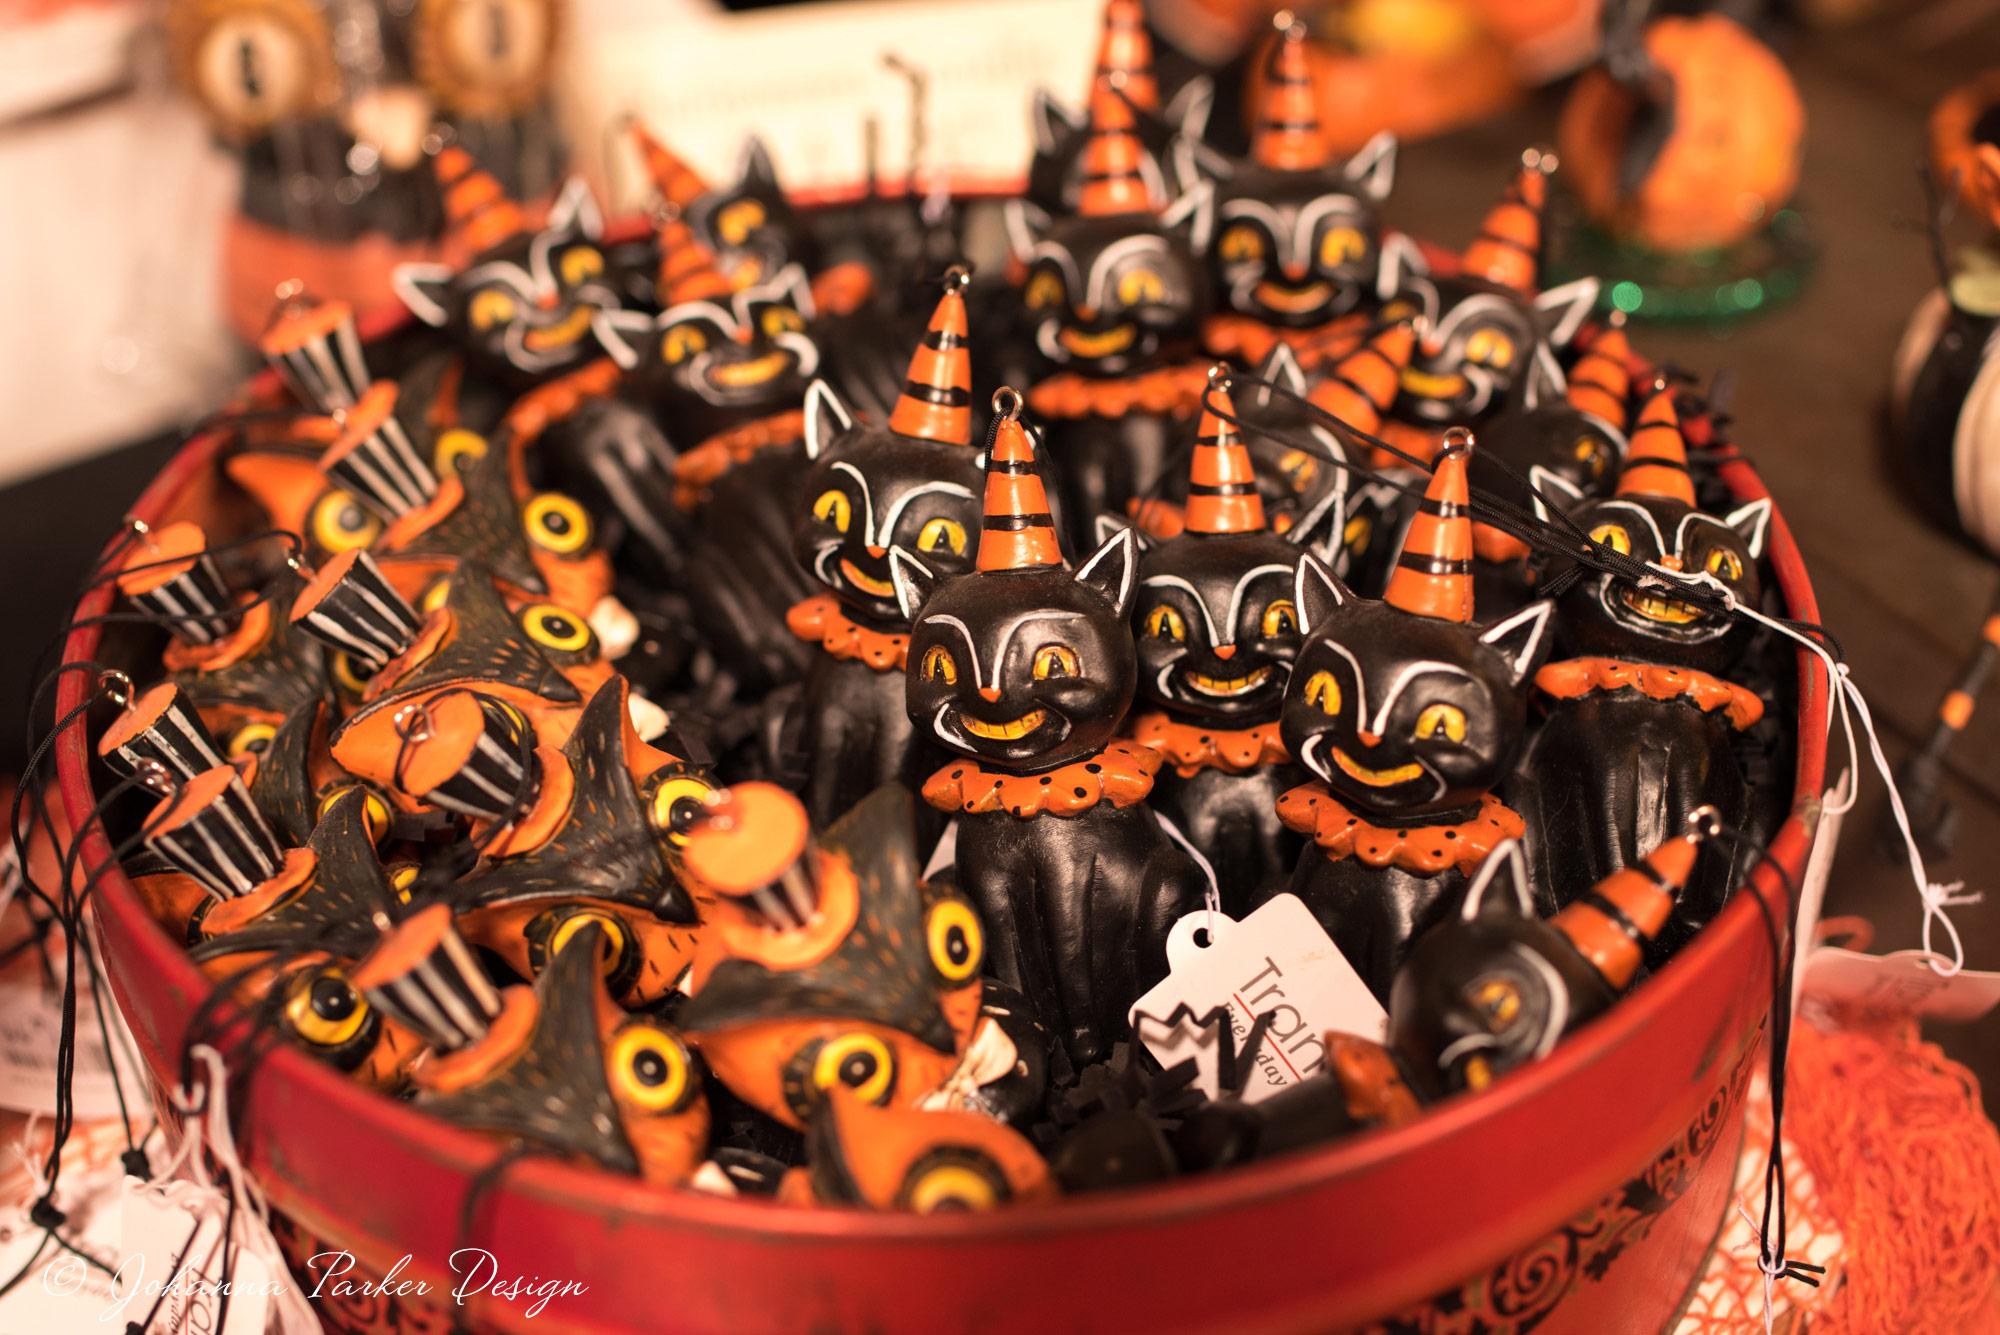 Johanna-Parker-Halloween-black-cat-owl-ornaments